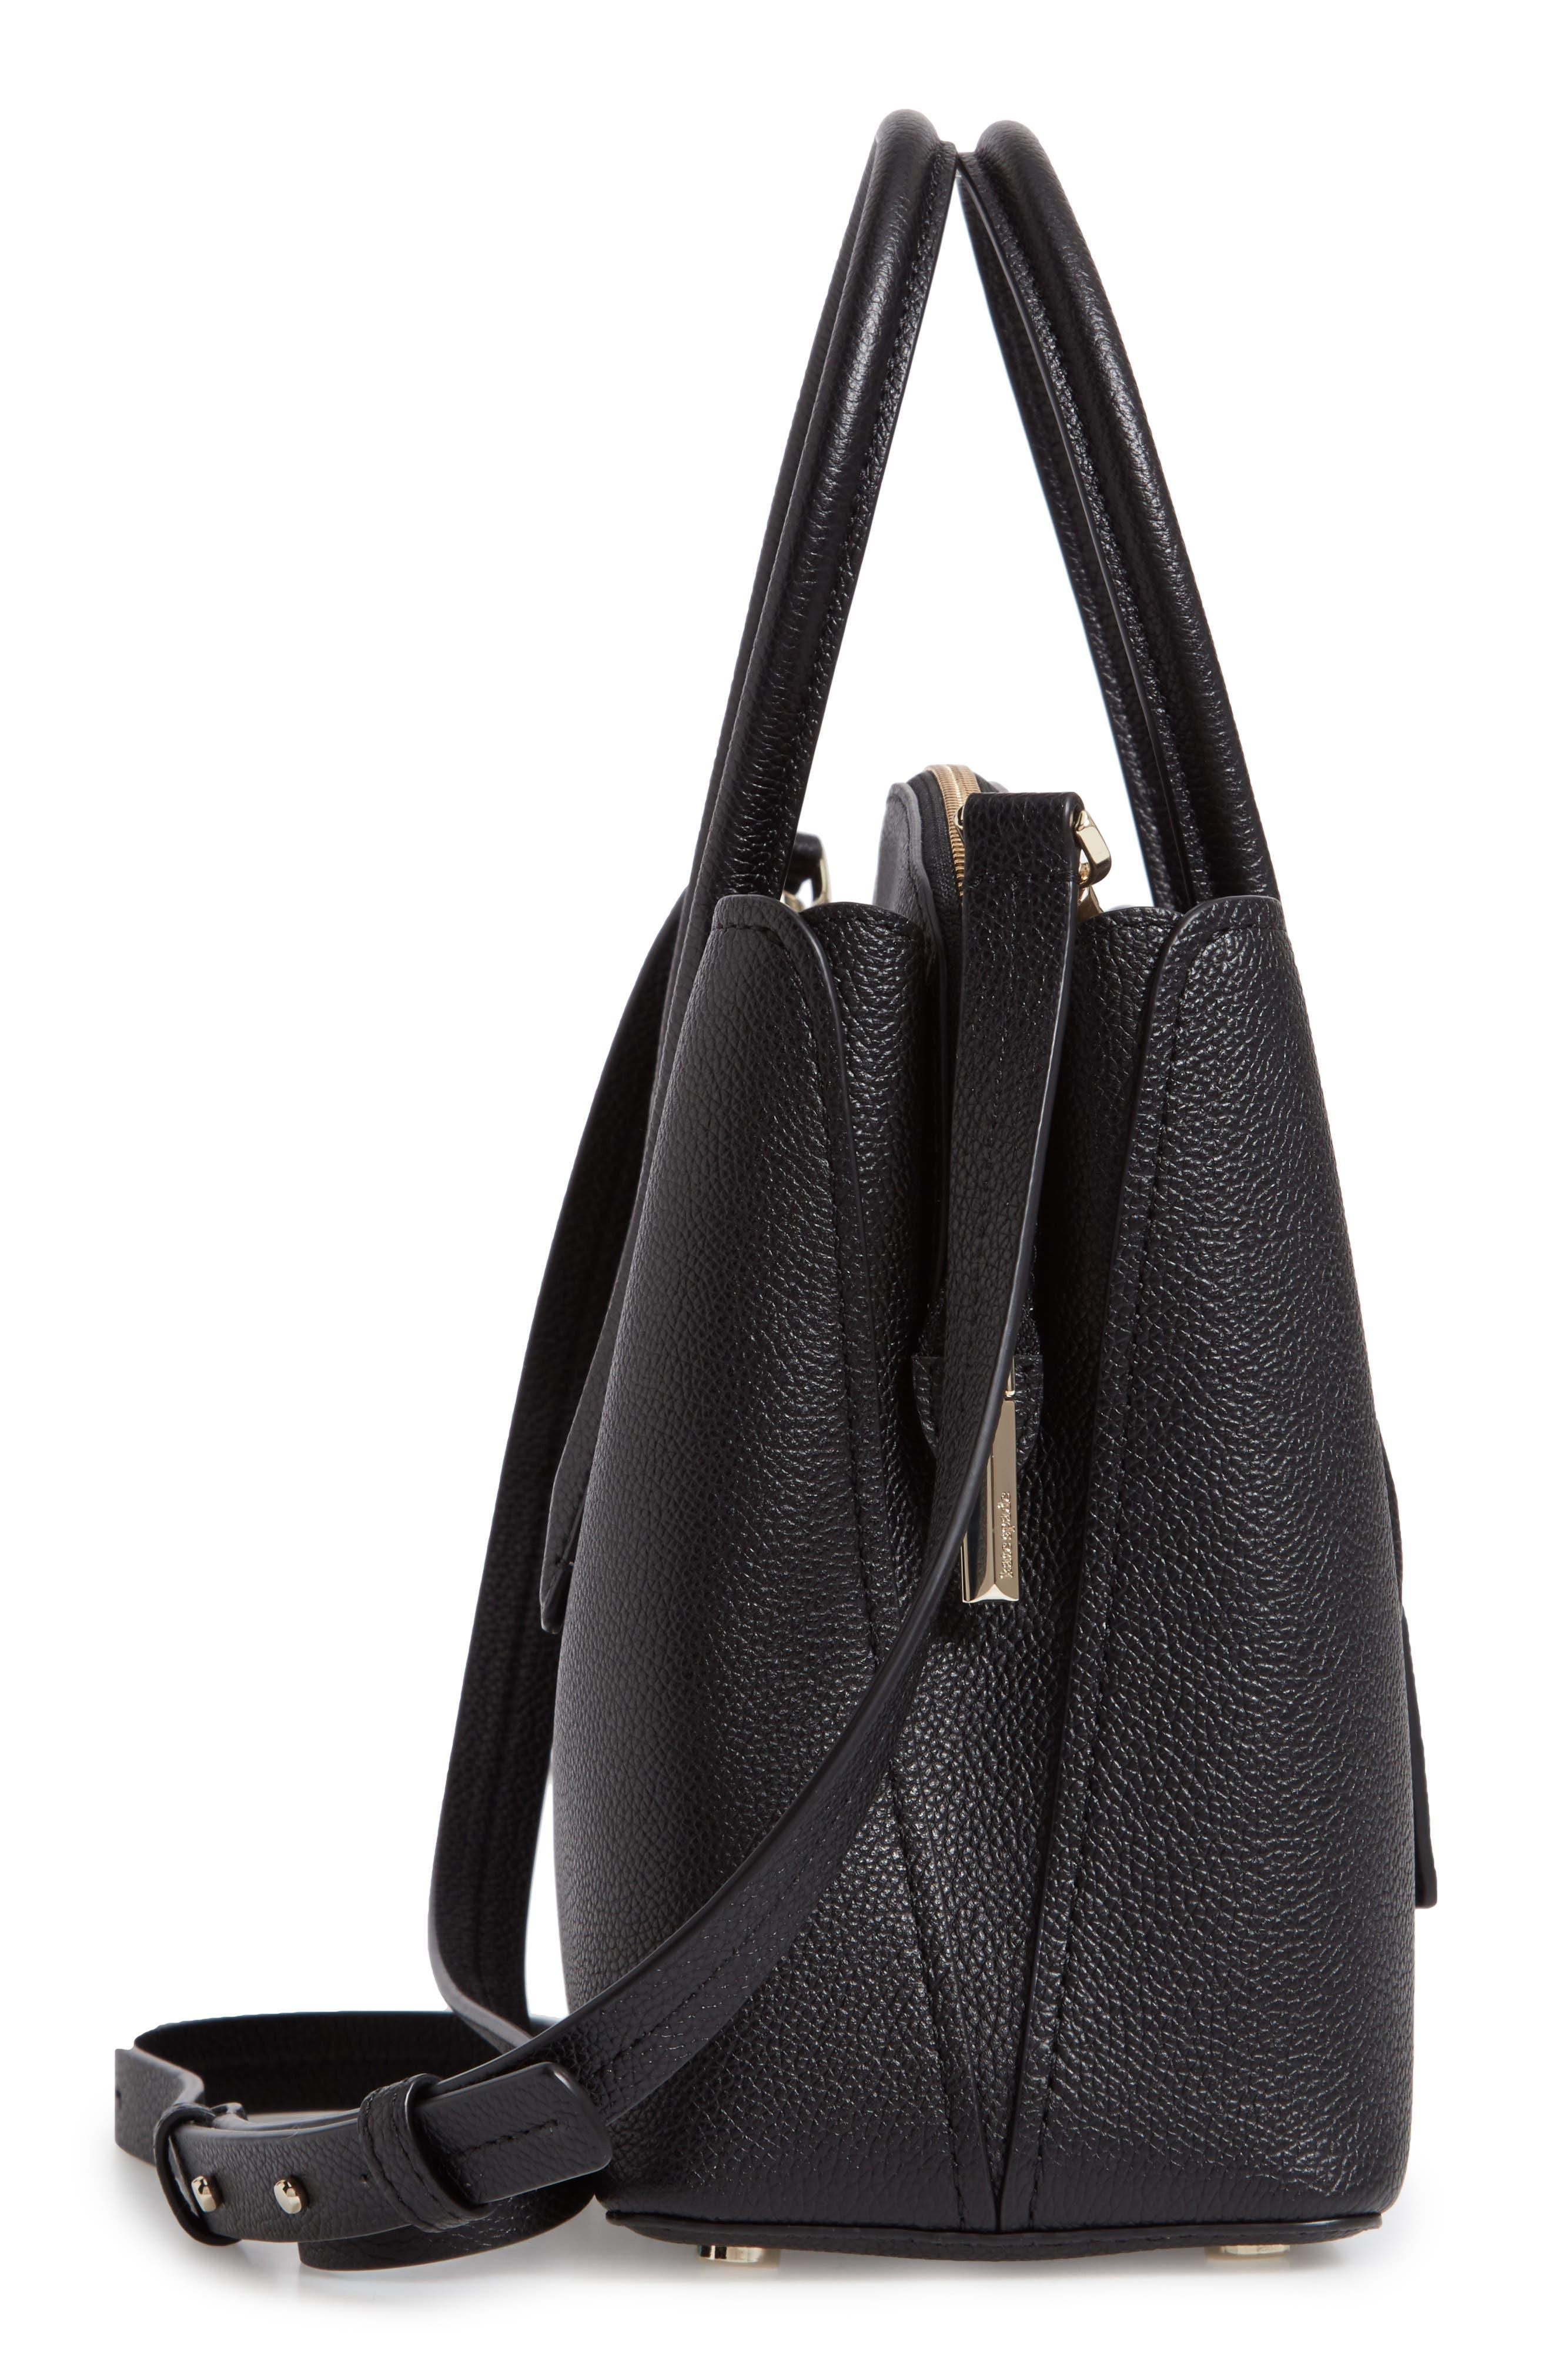 KATE SPADE NEW YORK, medium margaux leather satchel, Alternate thumbnail 6, color, BLACK